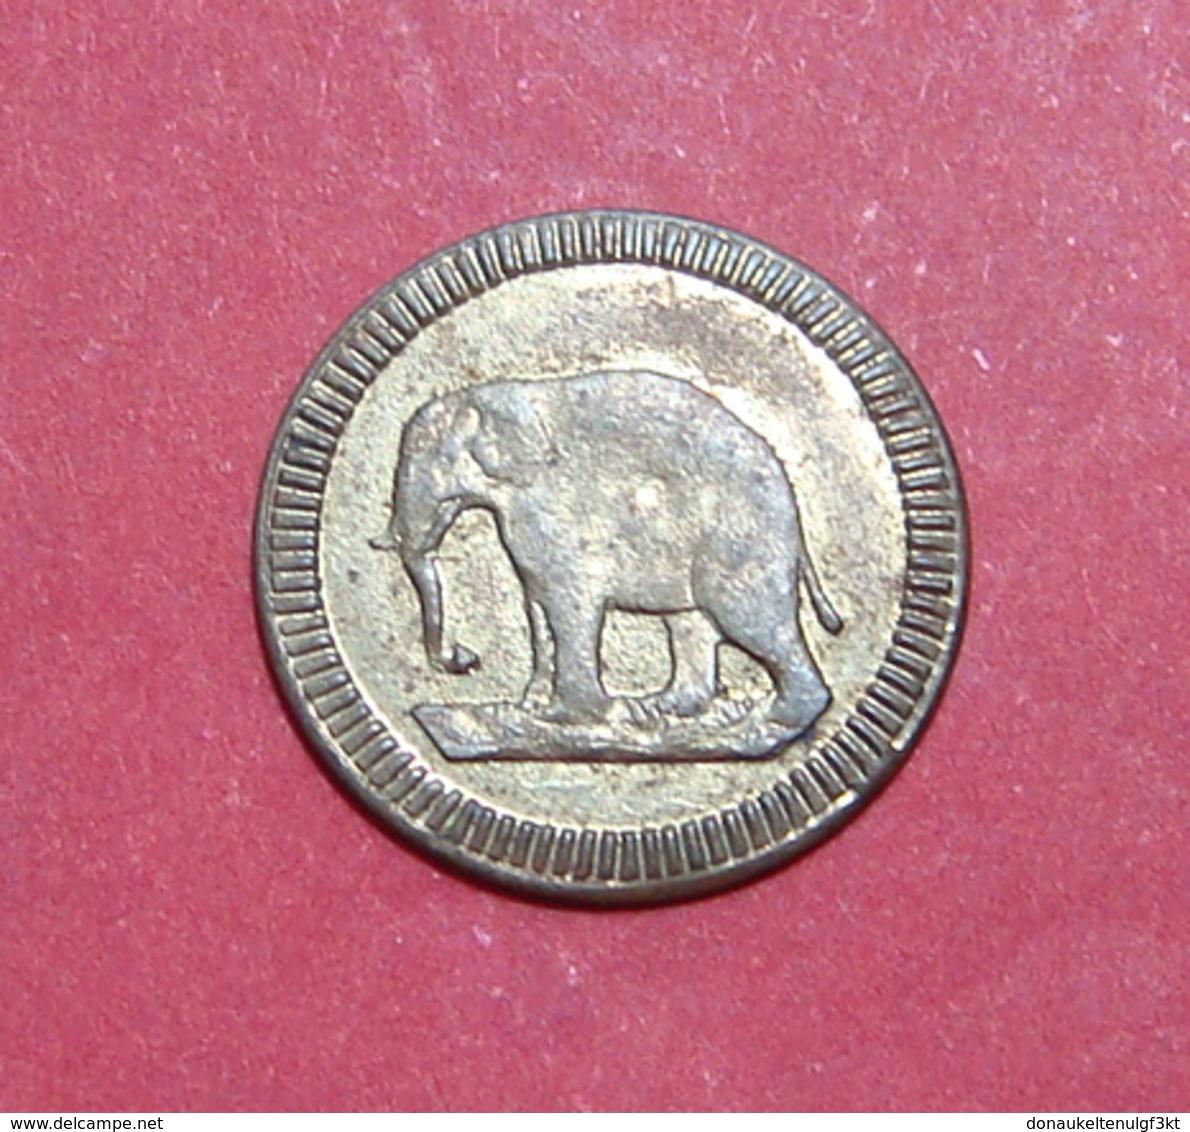 *ELEPHANT* GERMANY ND 1900 - 1920 SPIEL MARKE TOKEN, 15.2 Mm. UNC Quality - Casino